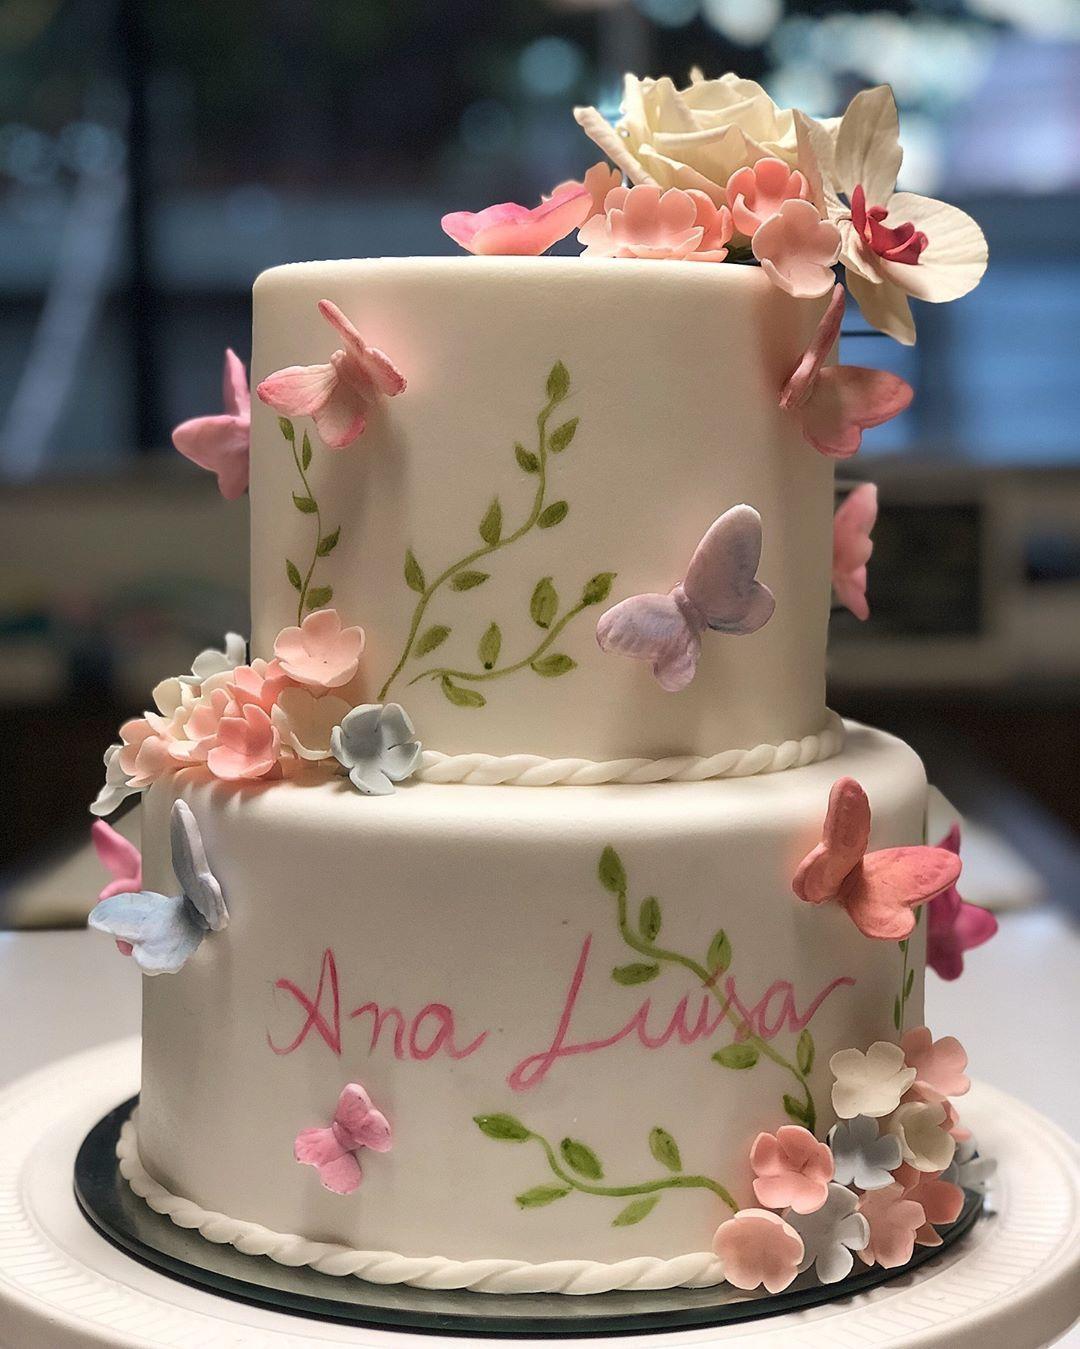 "Rafa Galindo on Instagram: ""Many butterflies for Ana Lu's baby shower ...#ana #baby #butterflies #galindo #instagram #lus #rafa #shower"